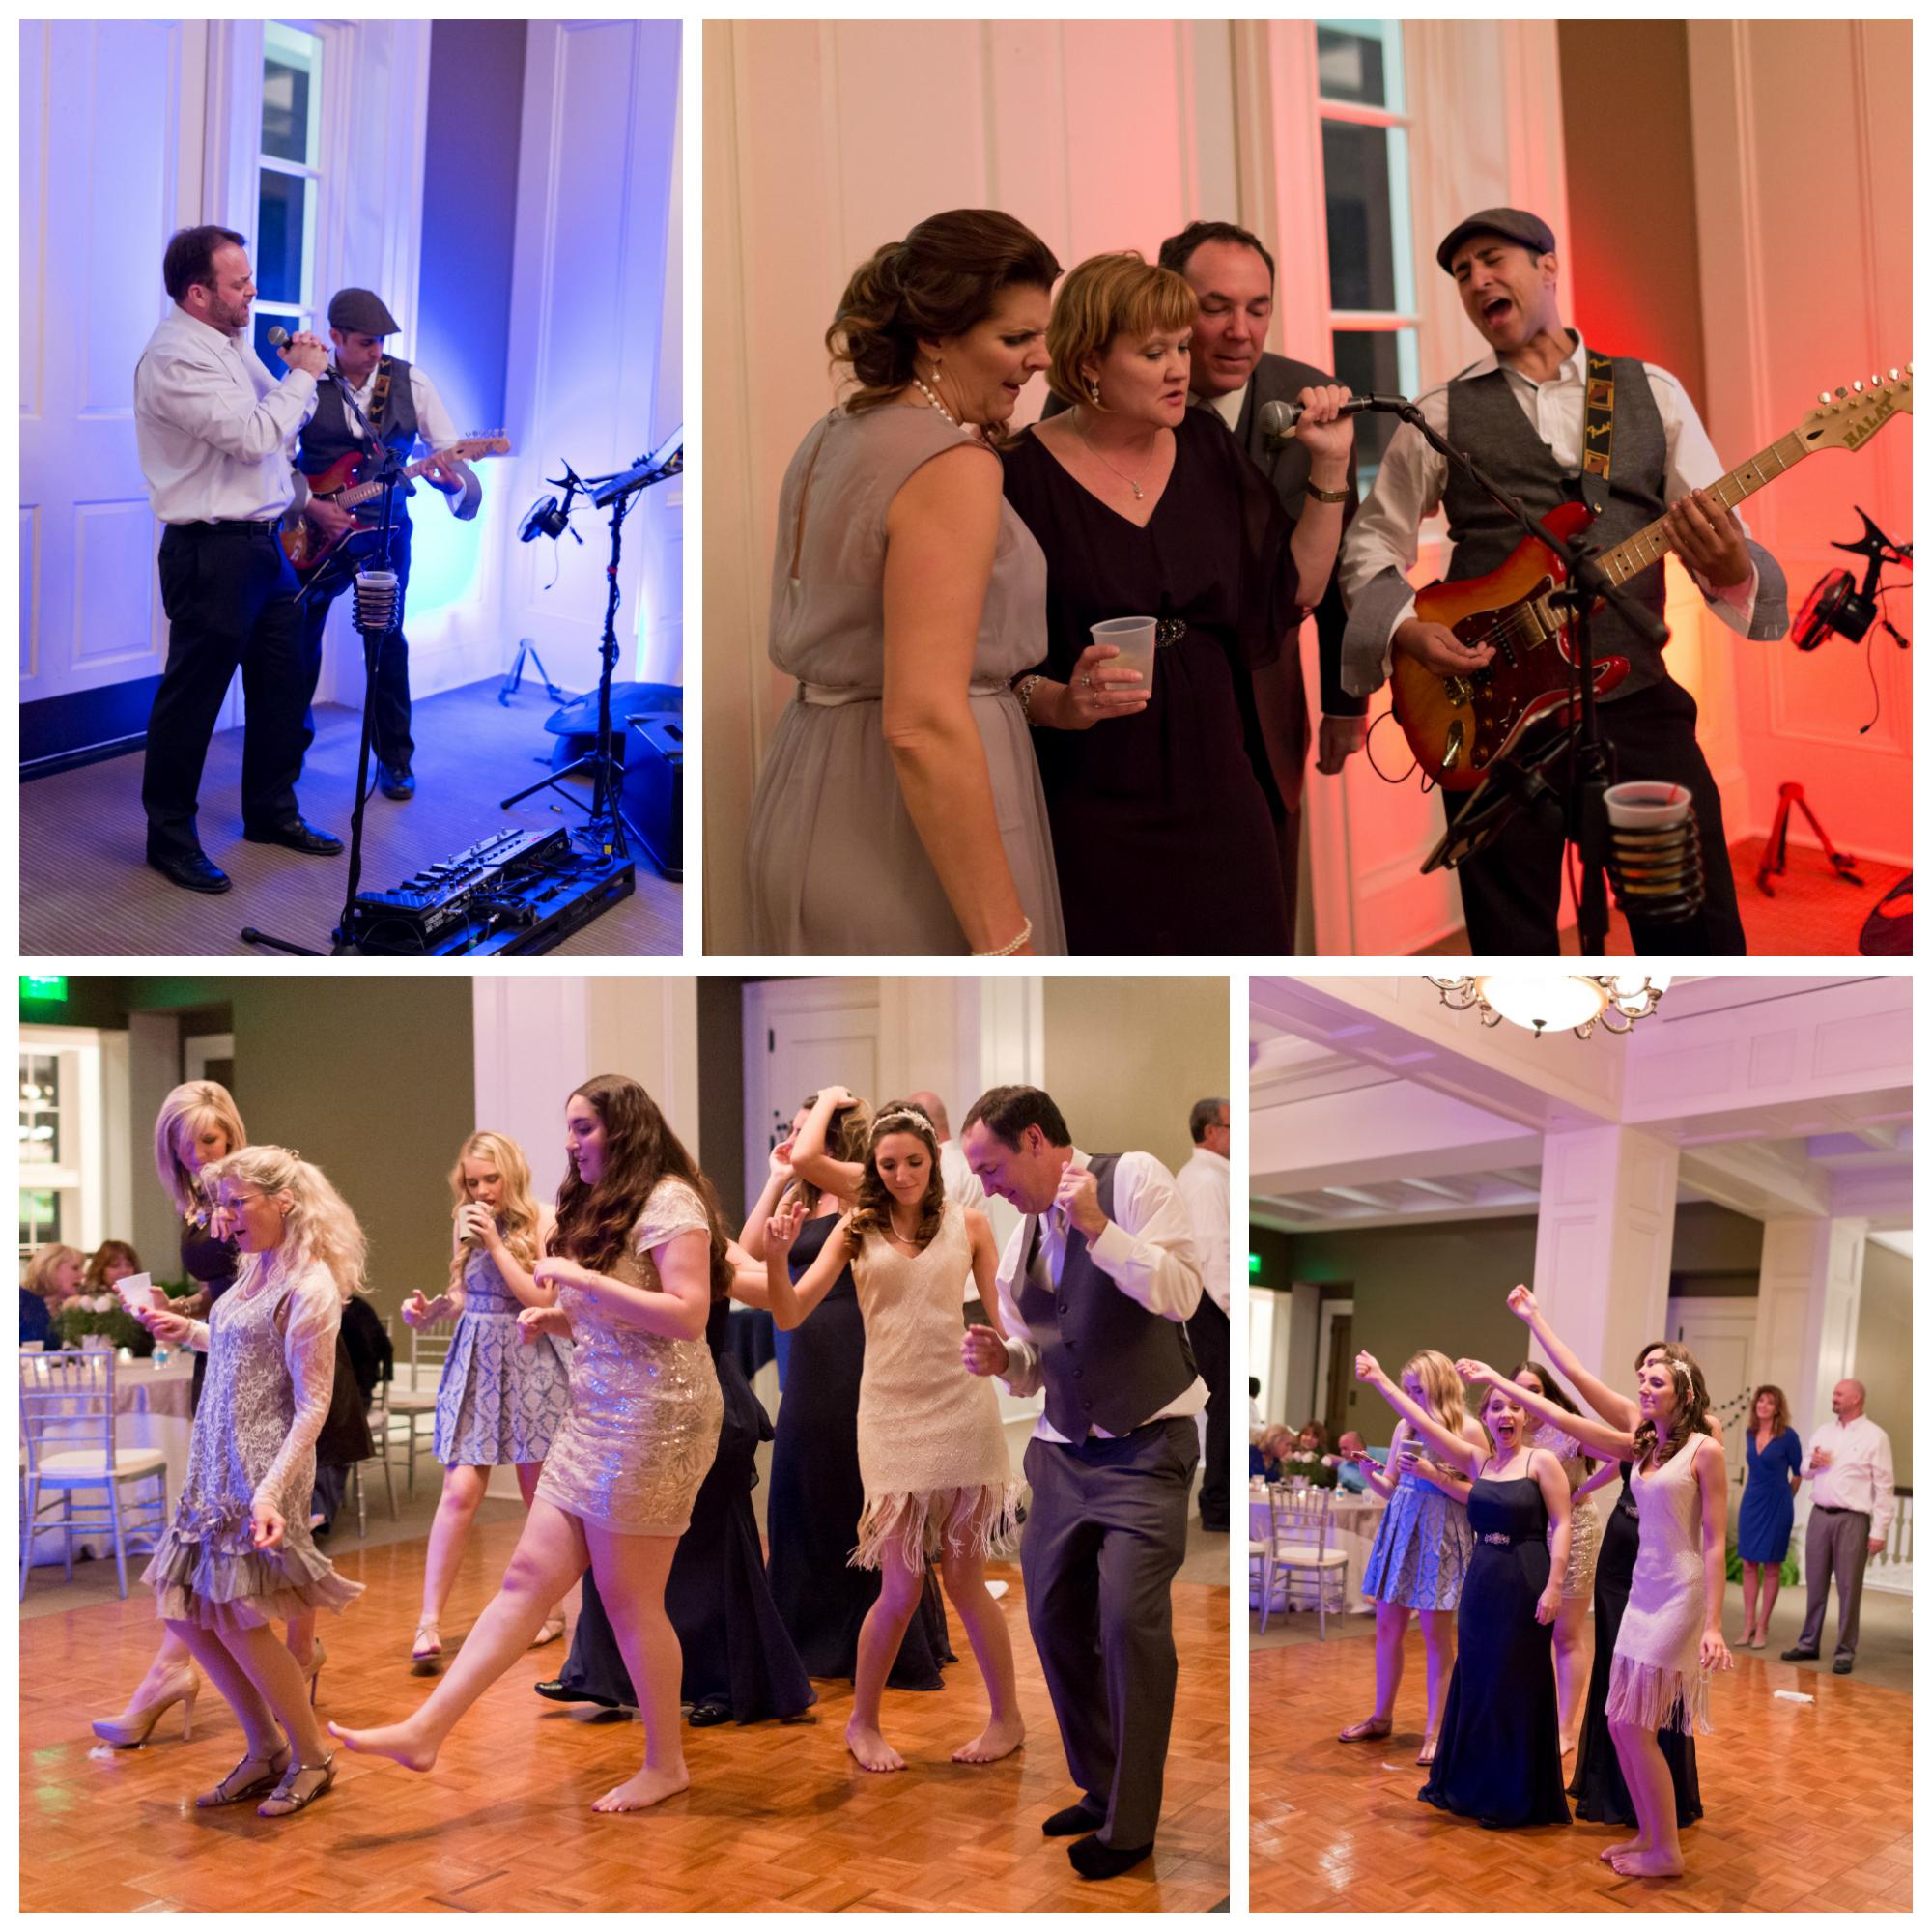 karaoke at wedding reception